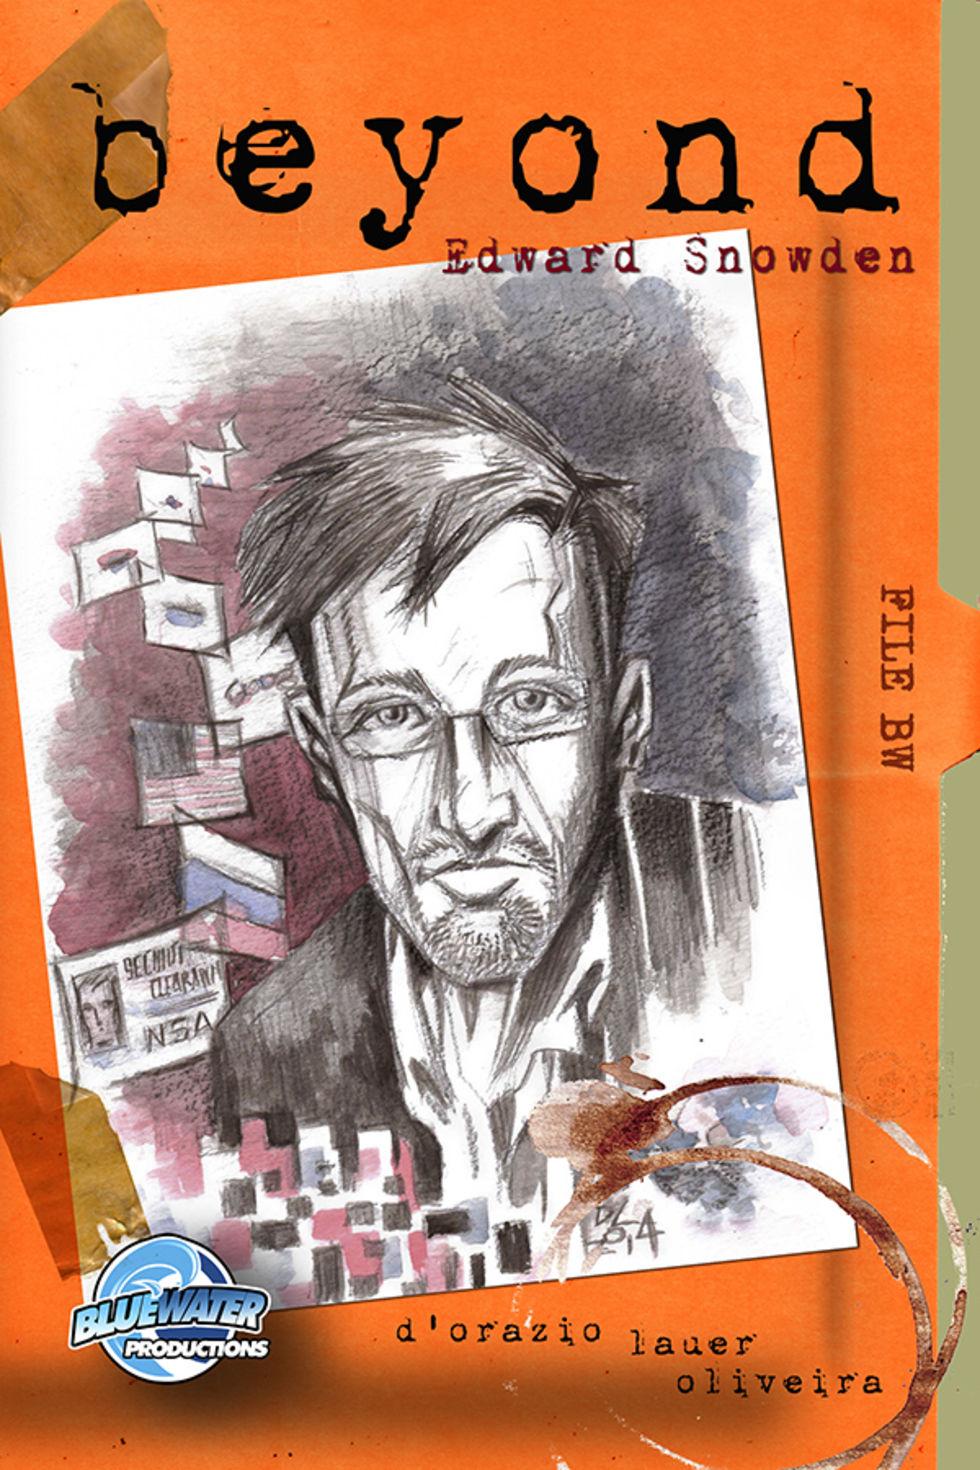 Edward Snowden blir serietidning